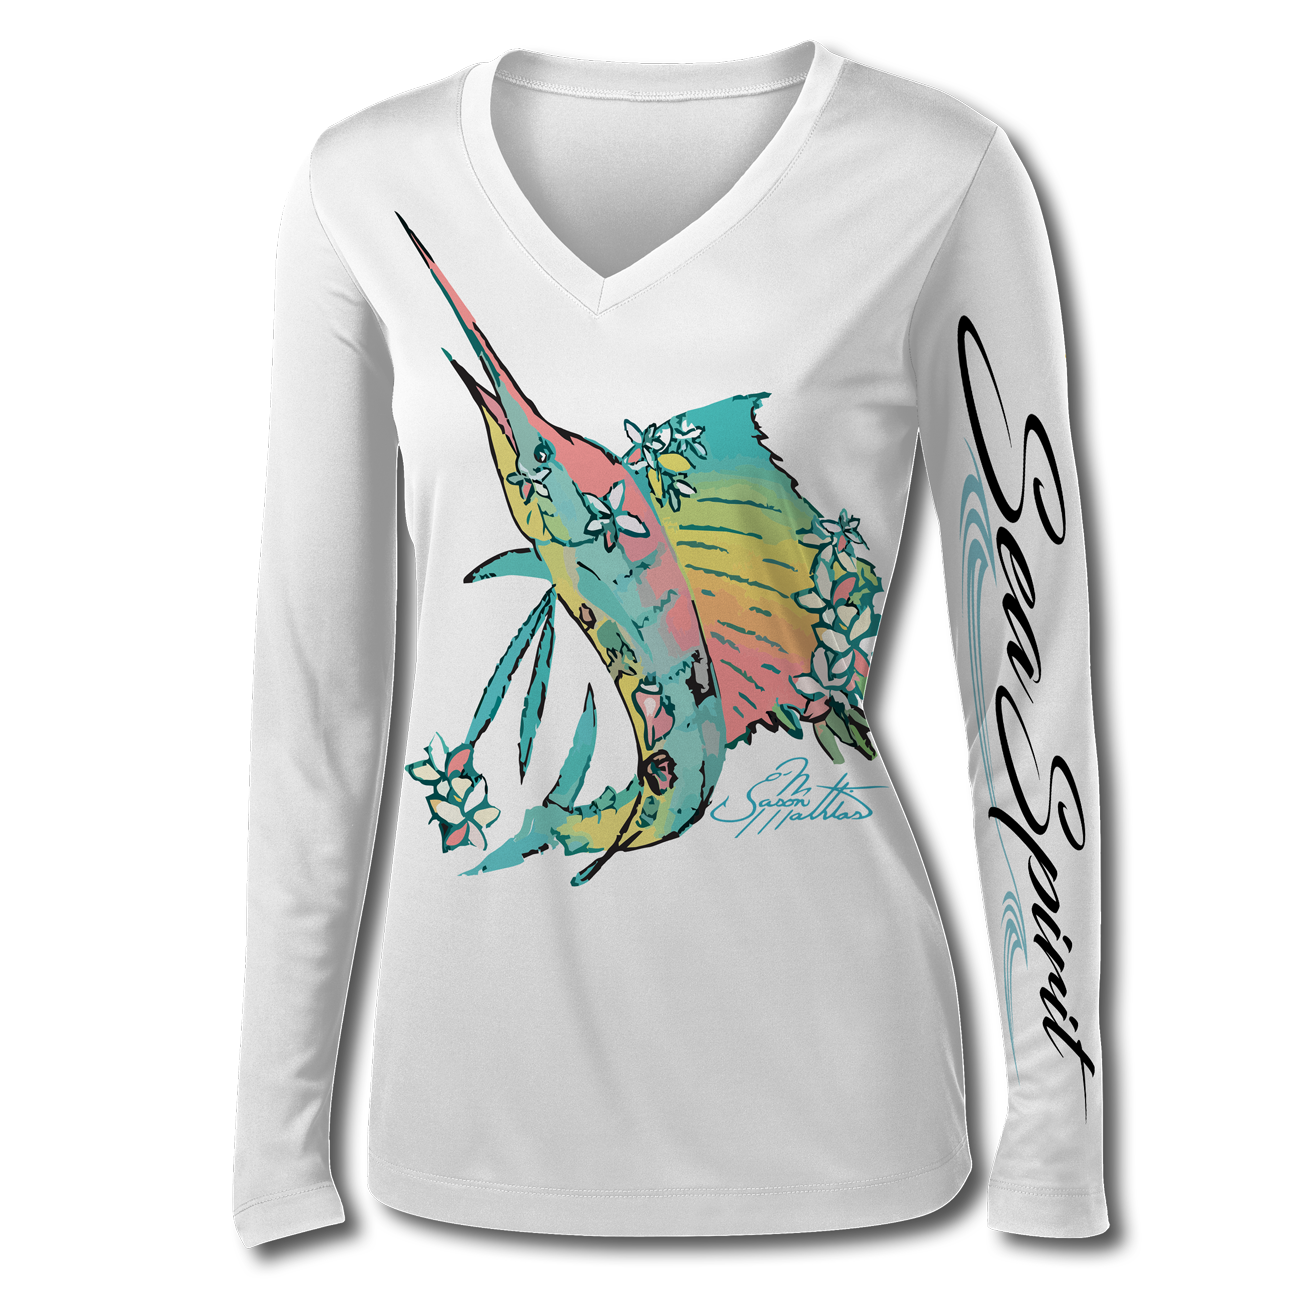 jason-mathias-sea-spirit-womans-sailfish-flowers-seashells-white-front.png